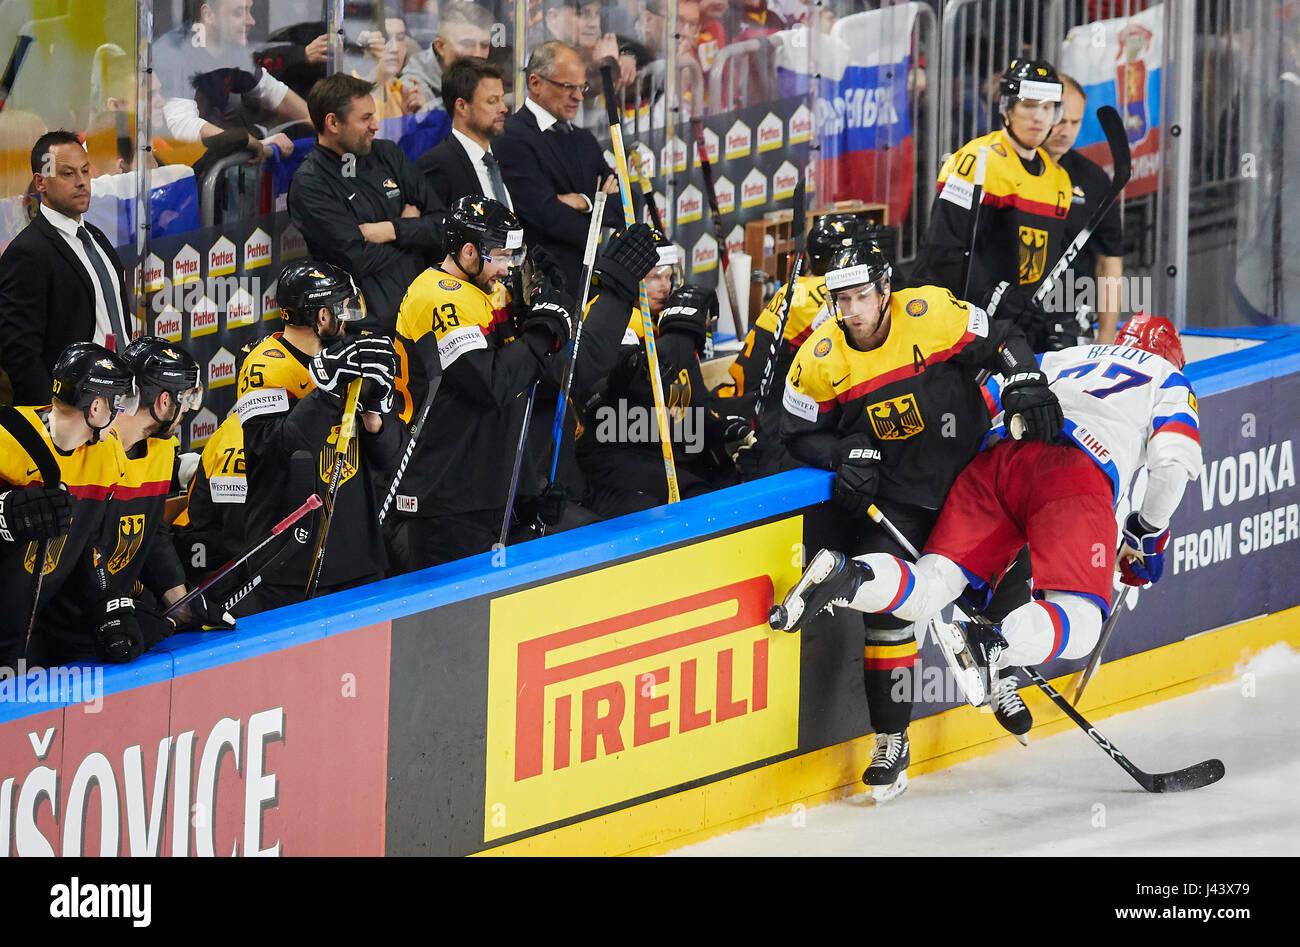 Markus KINK, DEB 17 checkt Anton BELOV, RUS 77 , dahinter NHL Profi Christian EHRHOFF, DEB 10 , links Nationalcoach Stock Photo